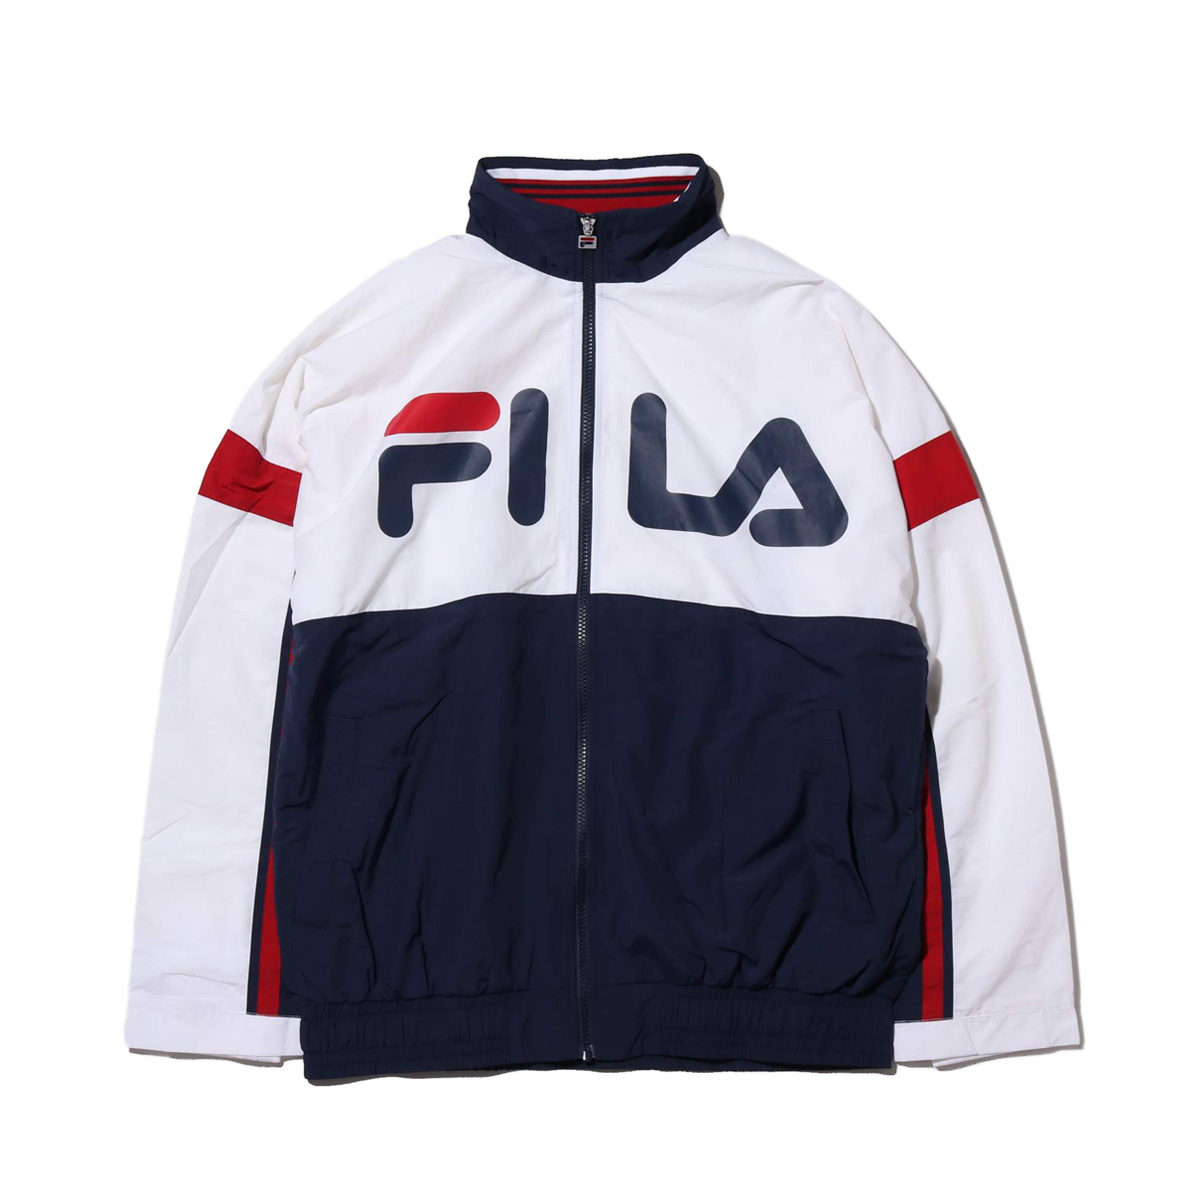 FILA WIND-UP Pullovre jacket(OFFWHITE)(フィラ ウィンドアップ プルオーバ― ジャケット)【メンズ】【ジャケット】【18FW-I】